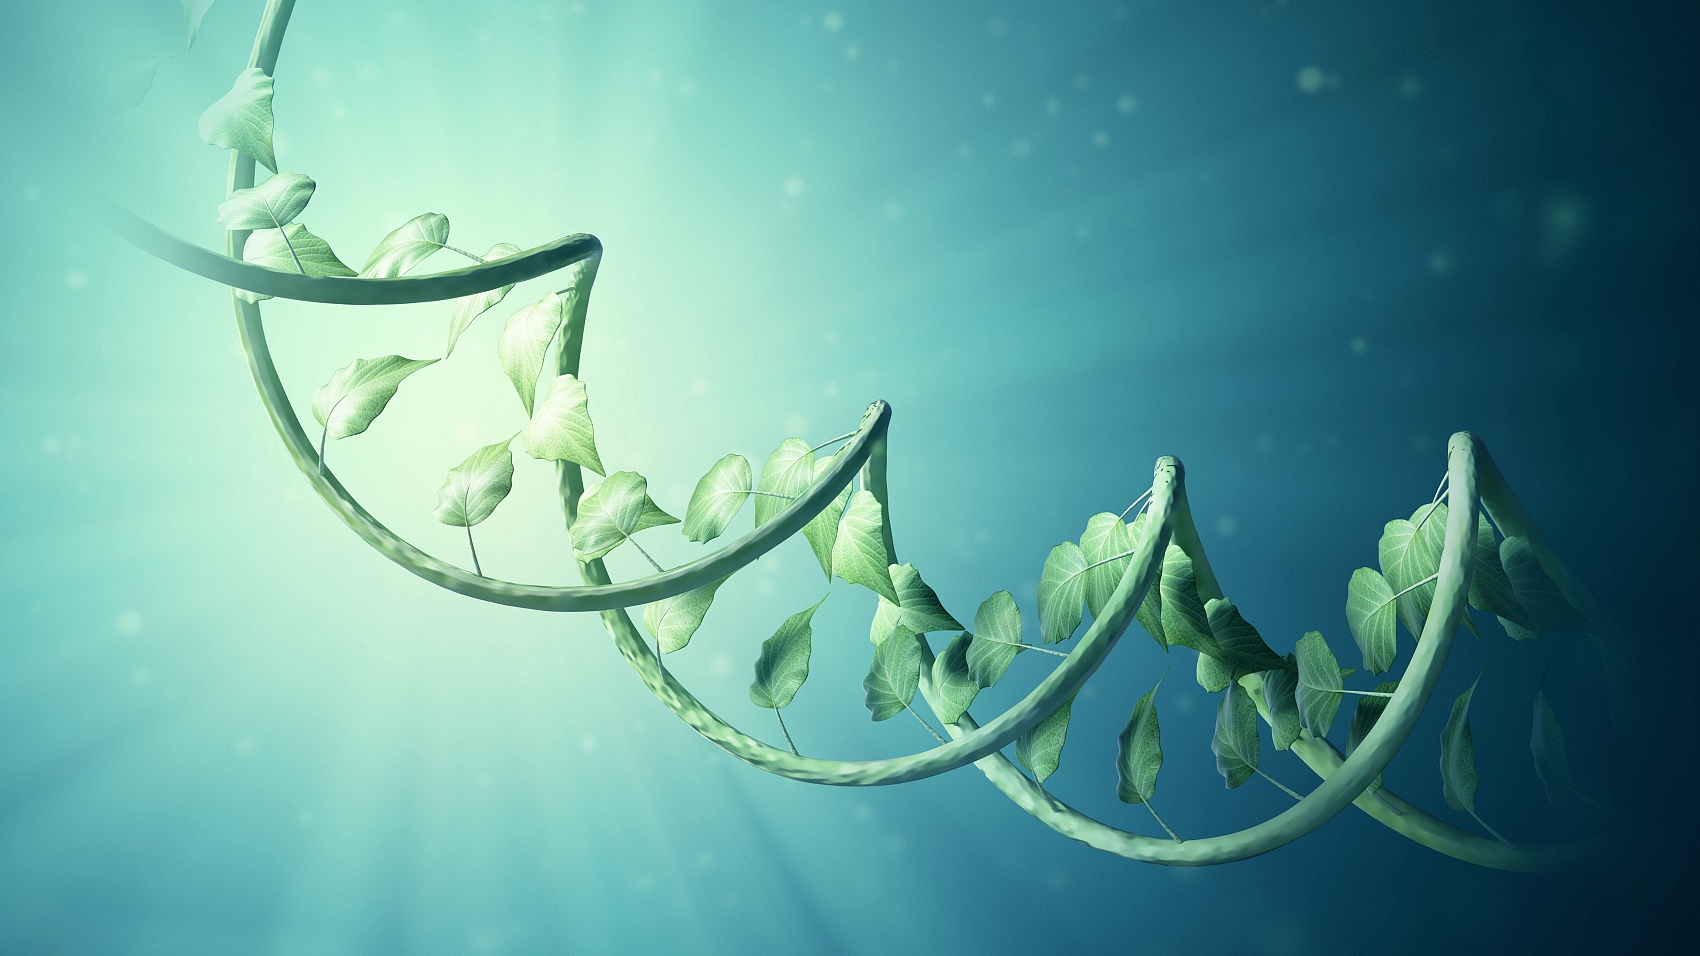 Scientists establish new plant genome engineering system